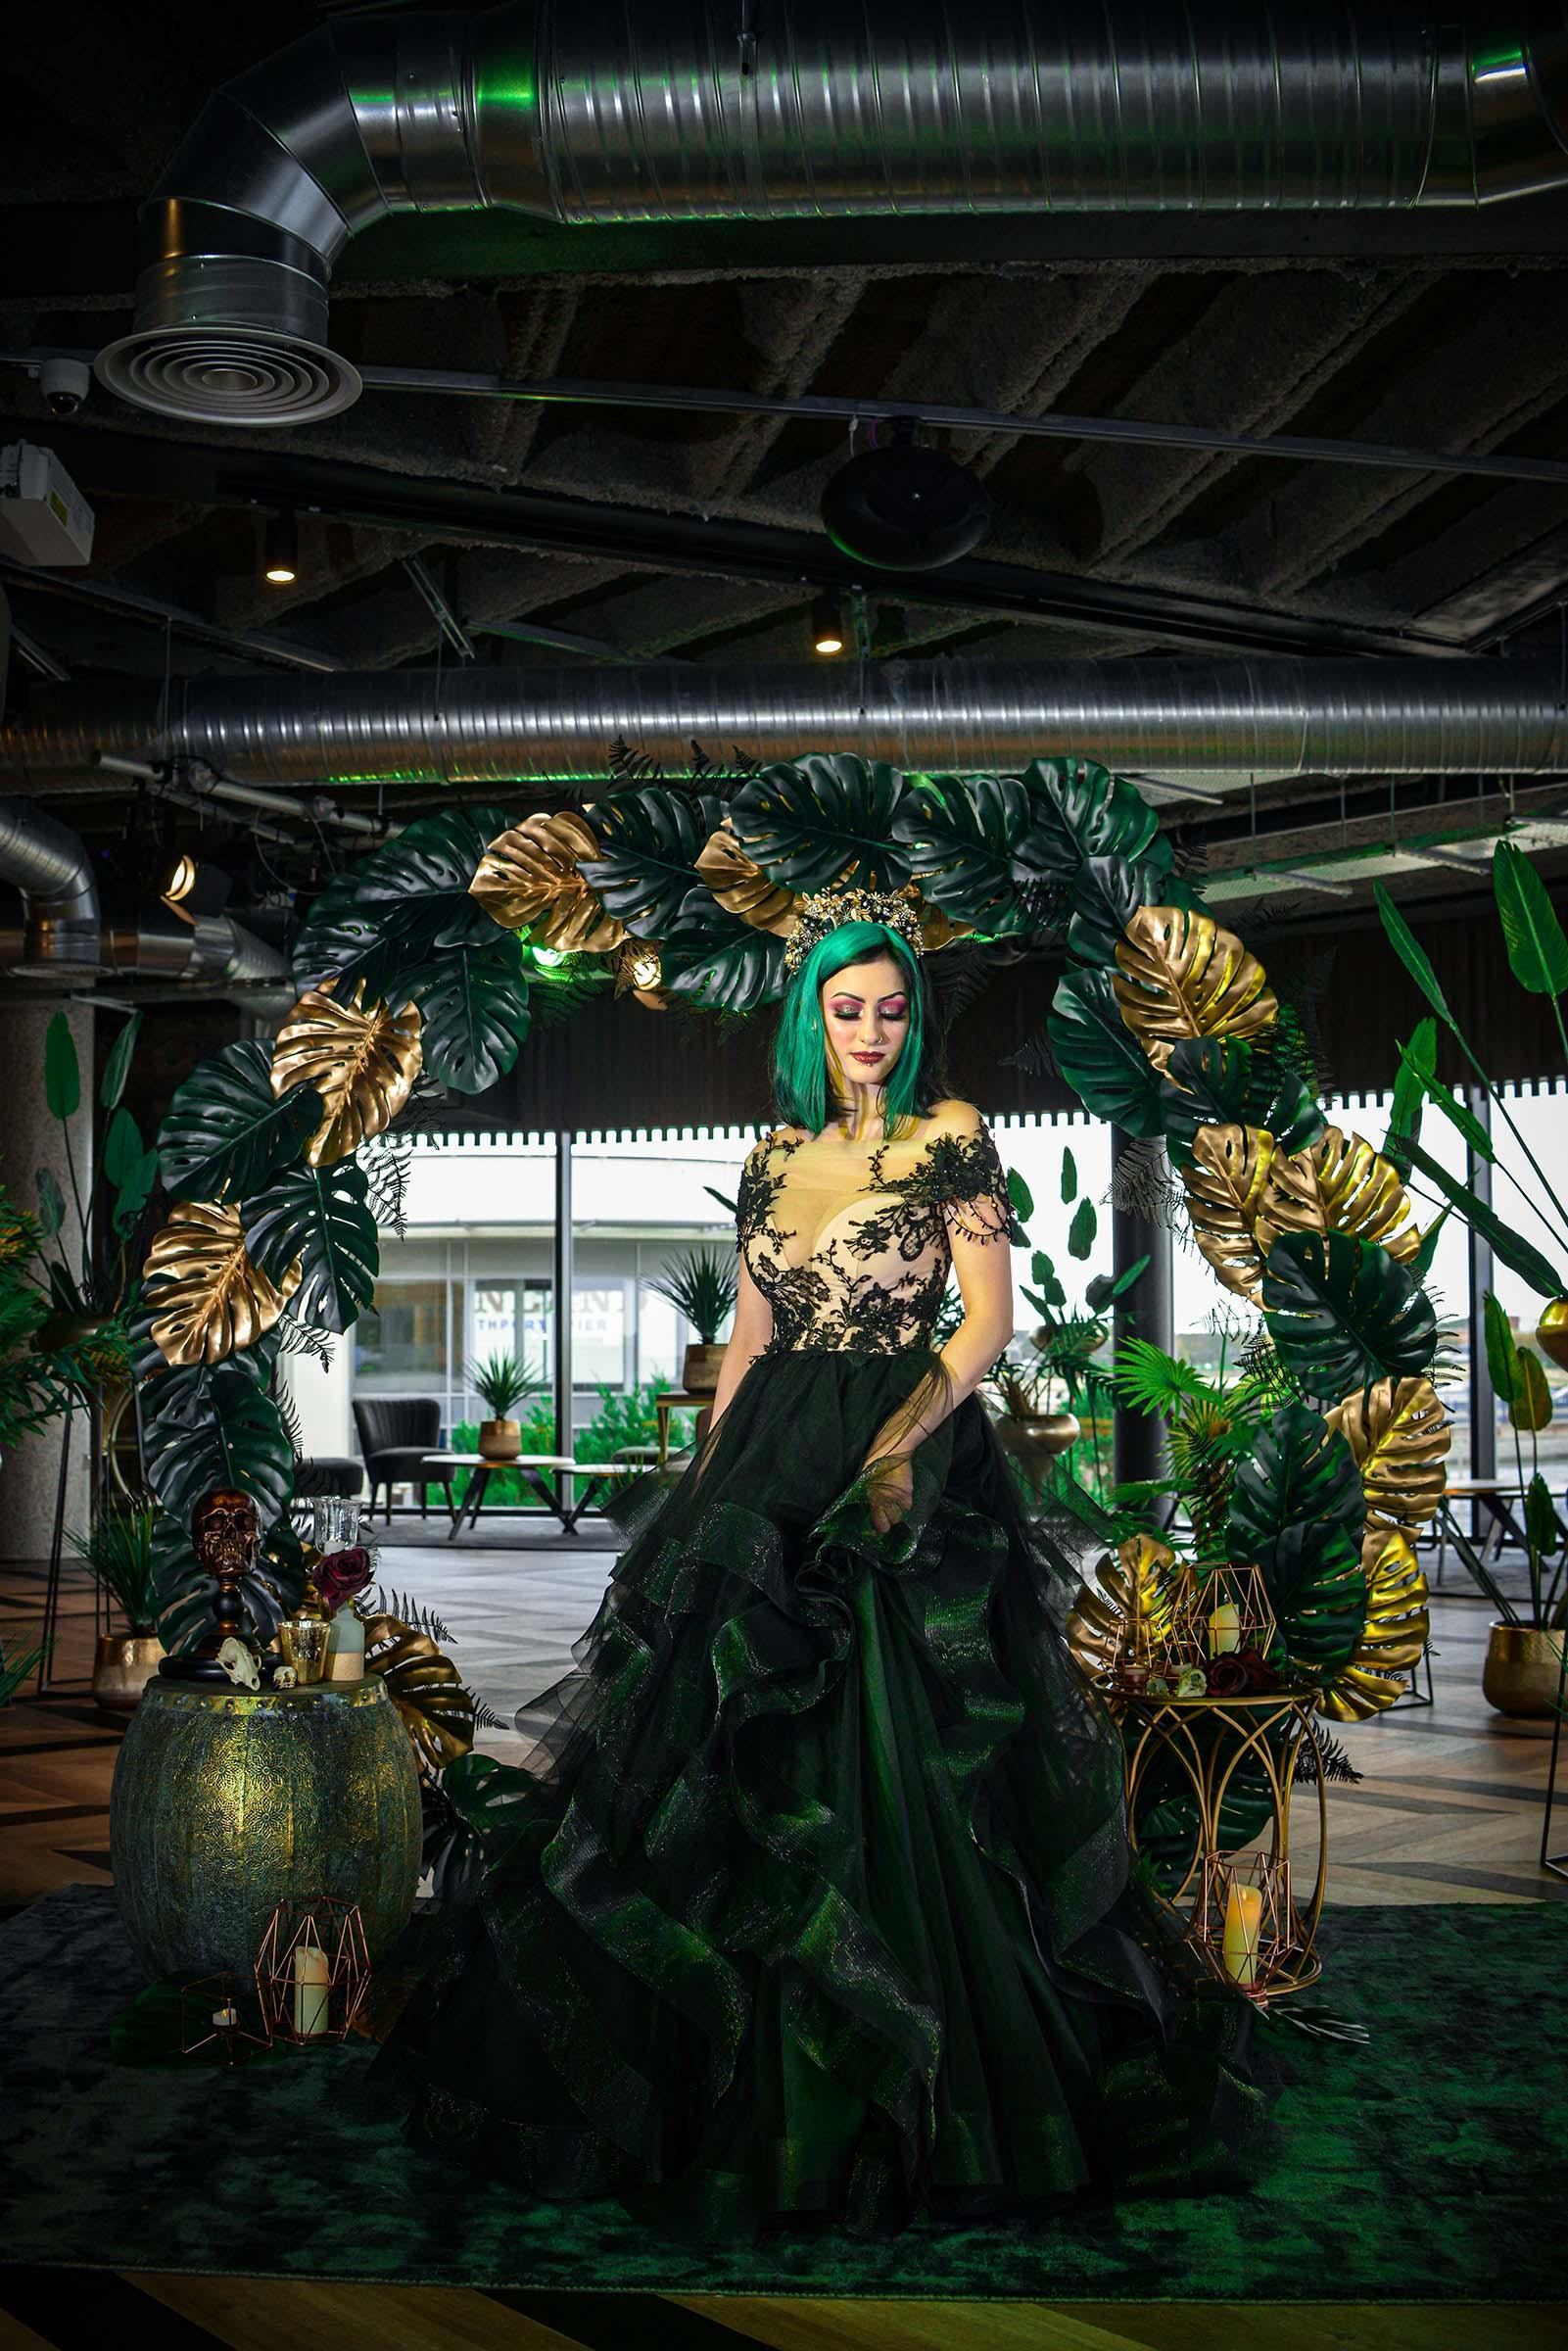 alternative luxe wedding - slytherin wedding - gothic wedding - alternative wedding - black wedding dress - alternative bridal wear - green and gold wedding